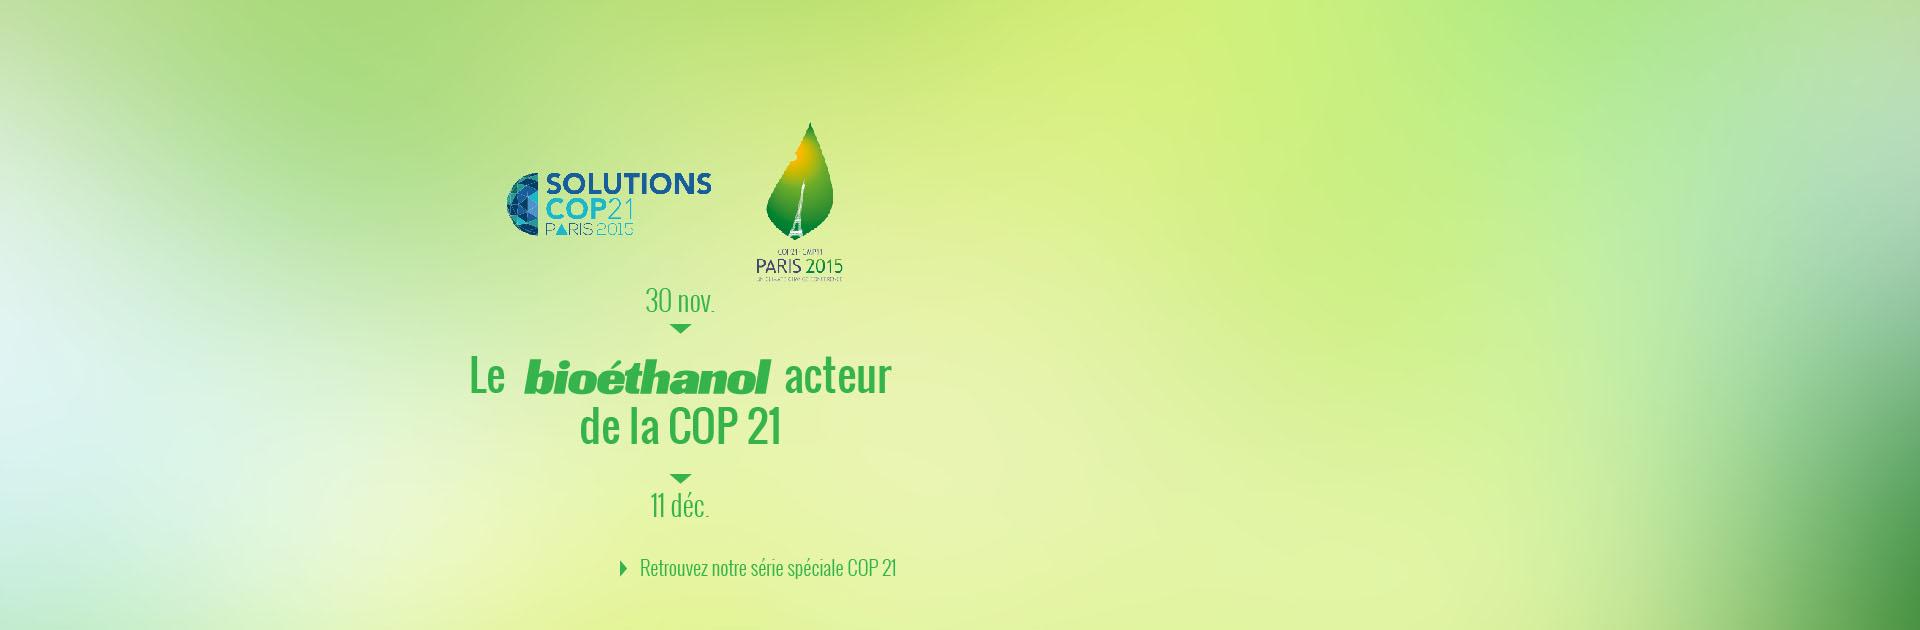 Sider-Bioethanol-a-la-COP21-Climat-1920_f8ee57812c9ce430e884d719b5b63489